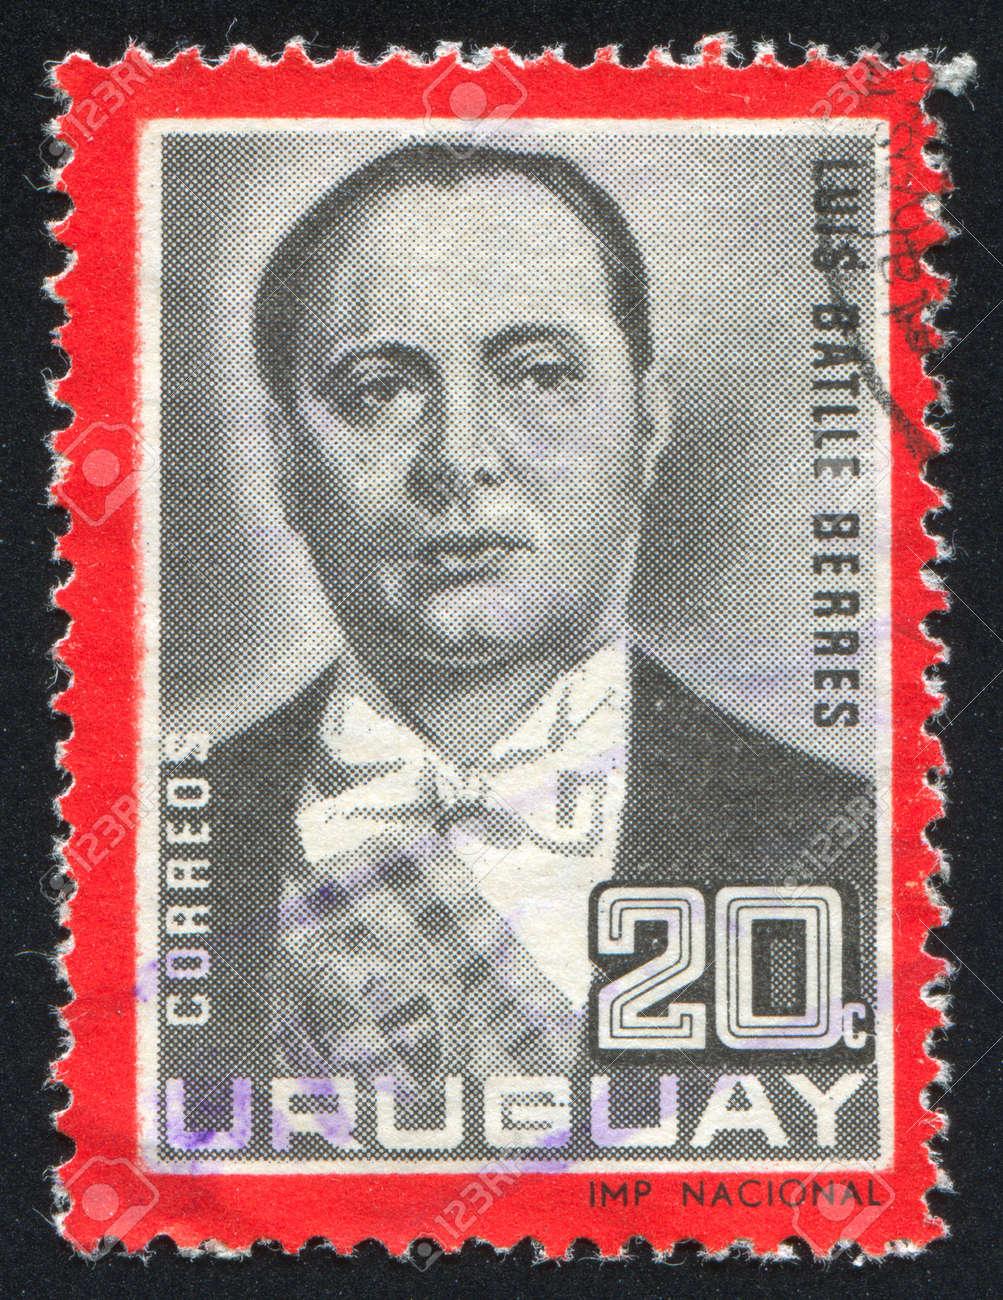 URUGUAY - CIRCA 1966: stamp printed by Uruguay, shows Luis Batlle Berres, circa 1966 Stock Photo - 14137045